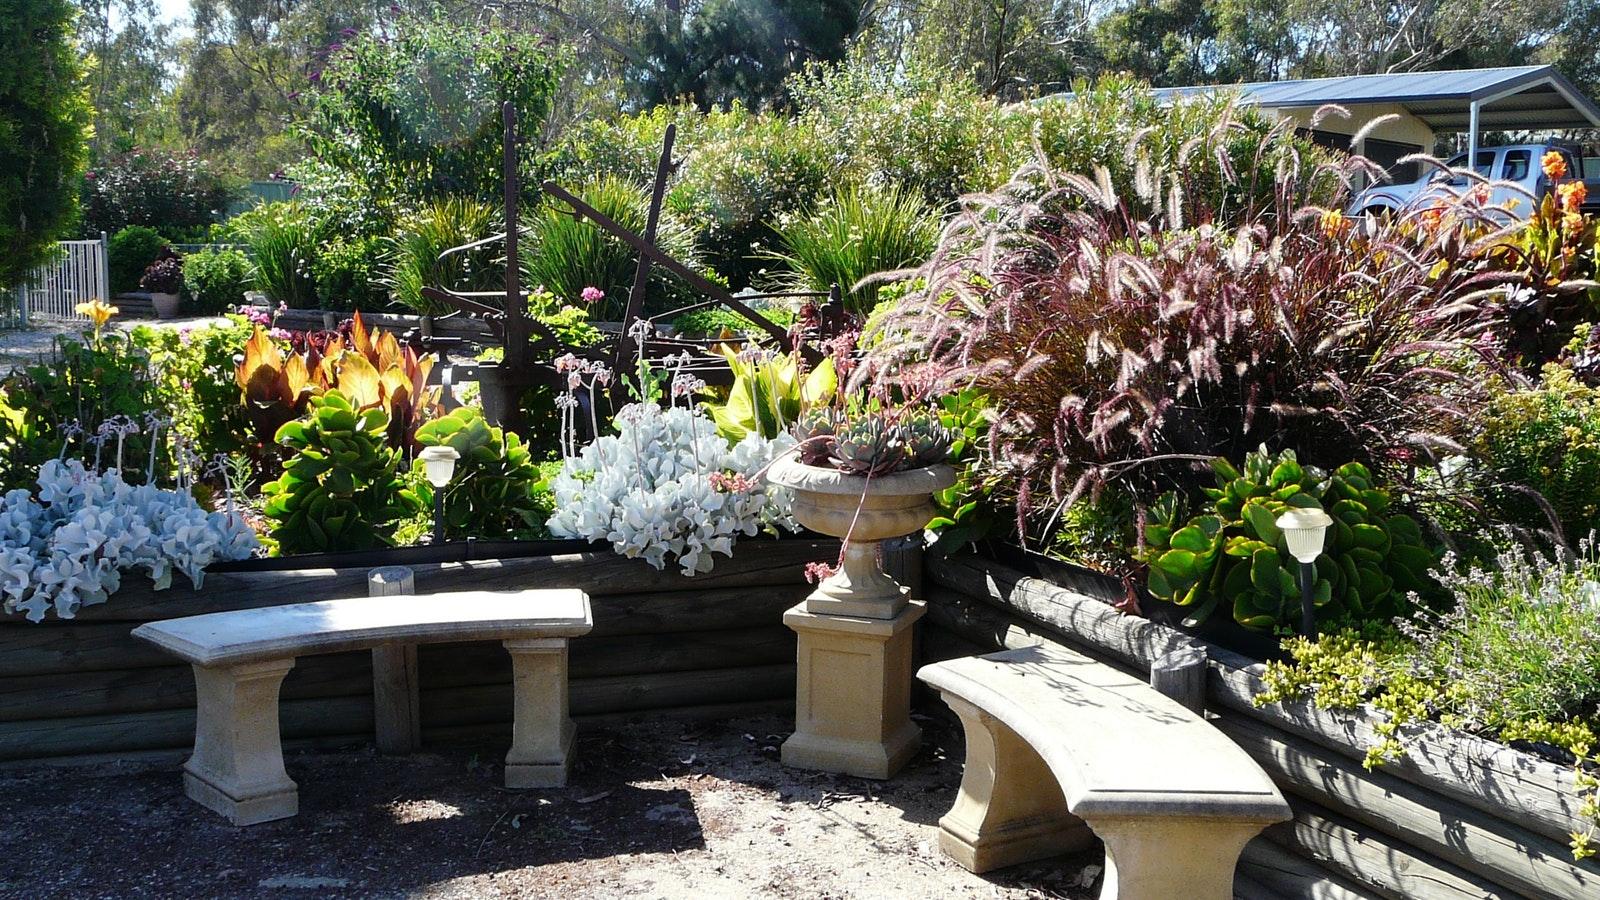 Garden surrounds